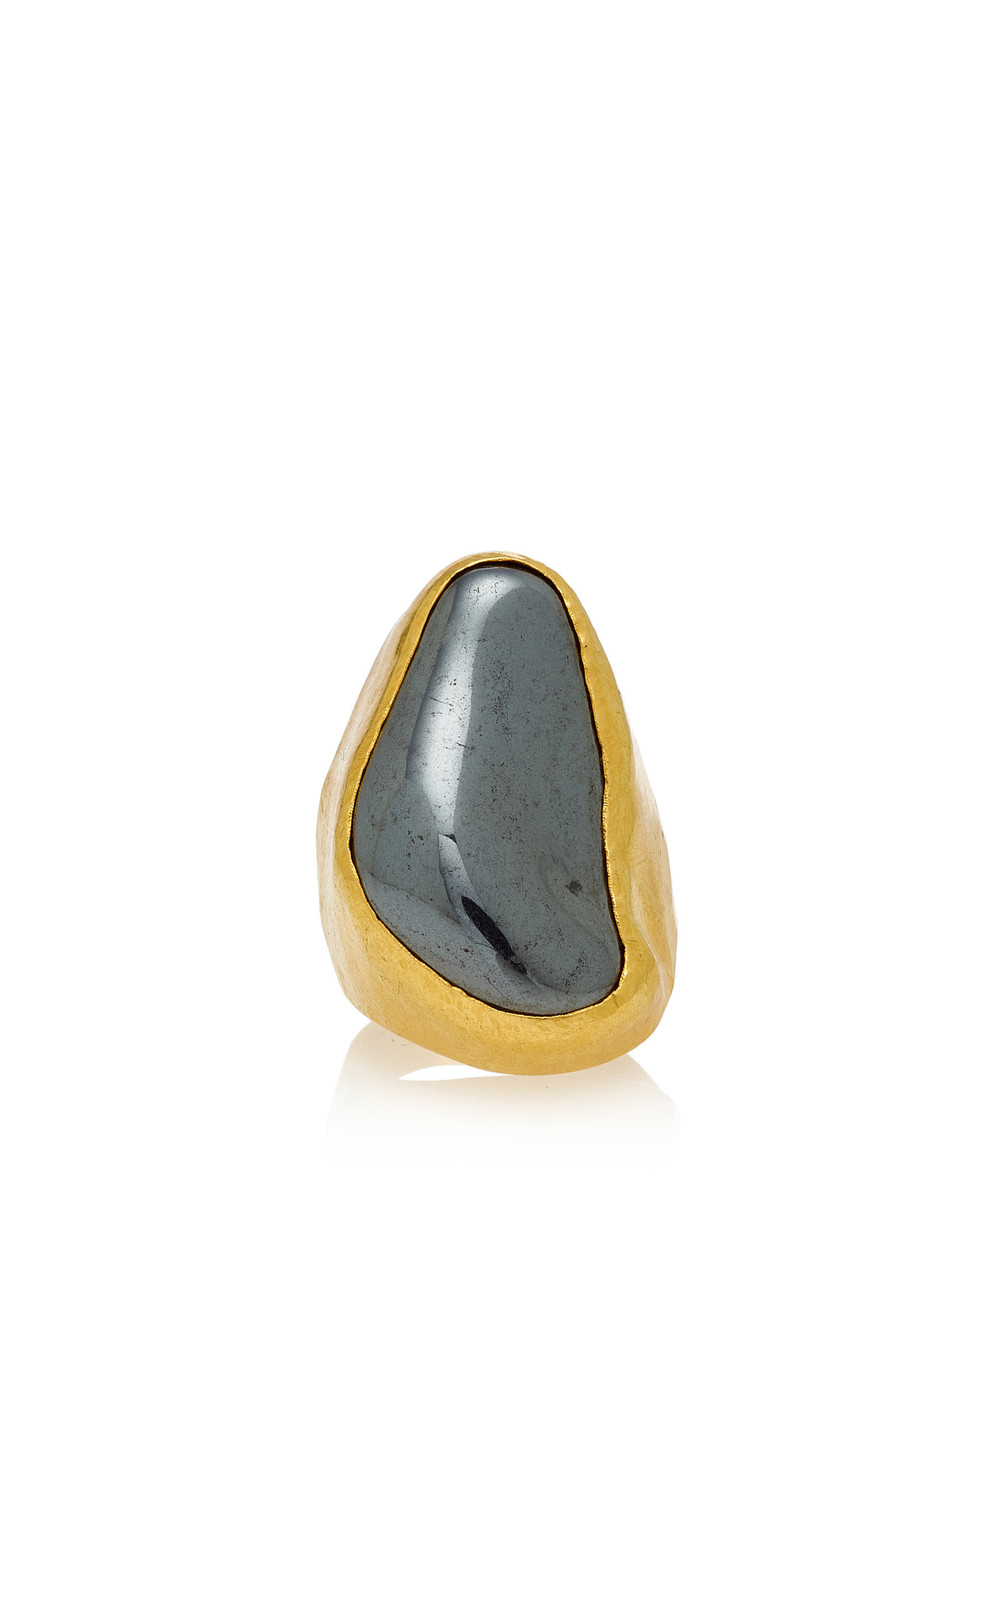 Pippa Small Tibetan Ring With Hematite in black